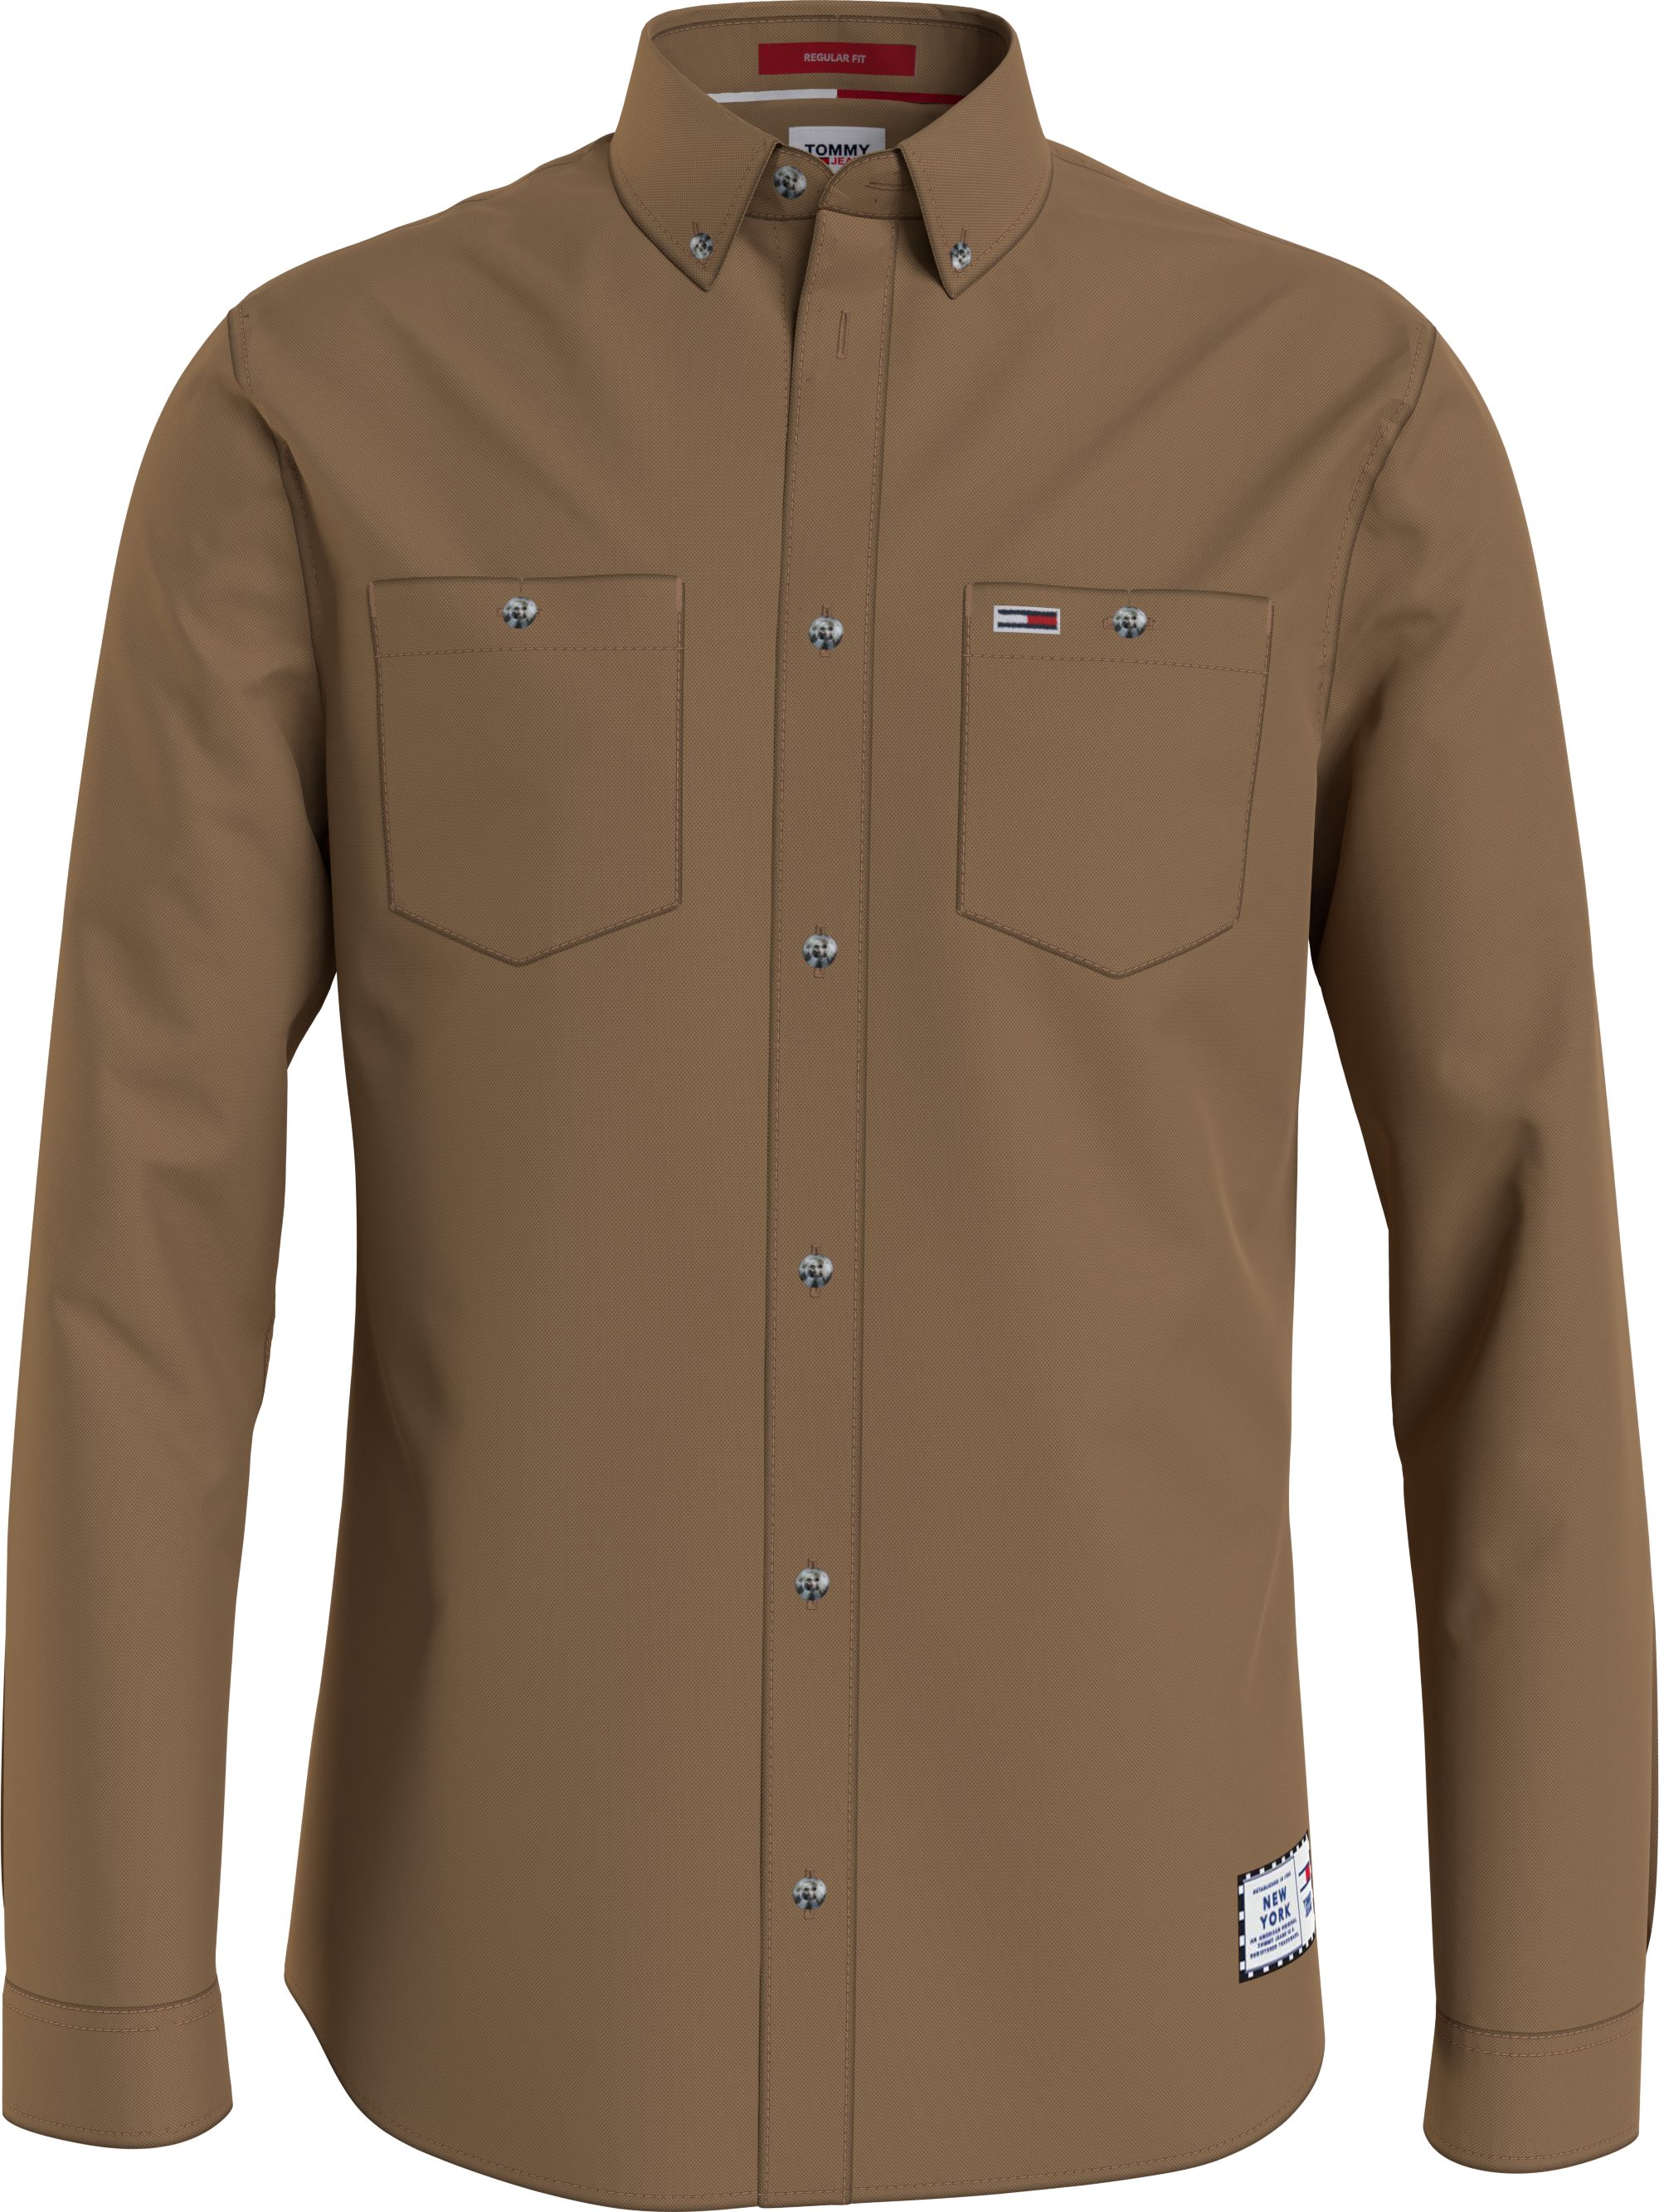 Hilfiger Denim Two-Tone Oxford Skjorte, Brun, S